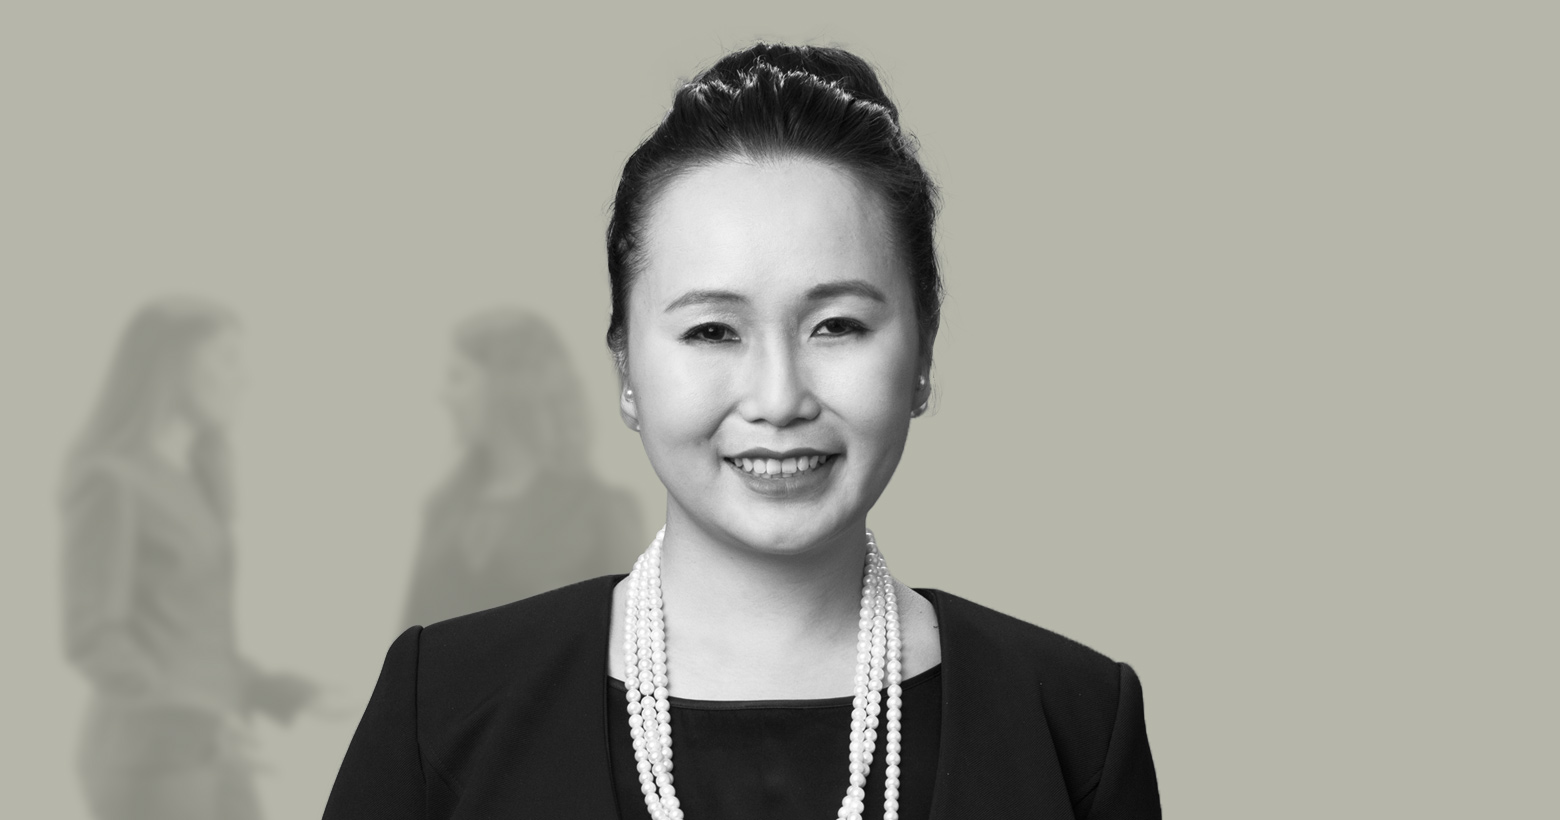 Mimi C. Cheng